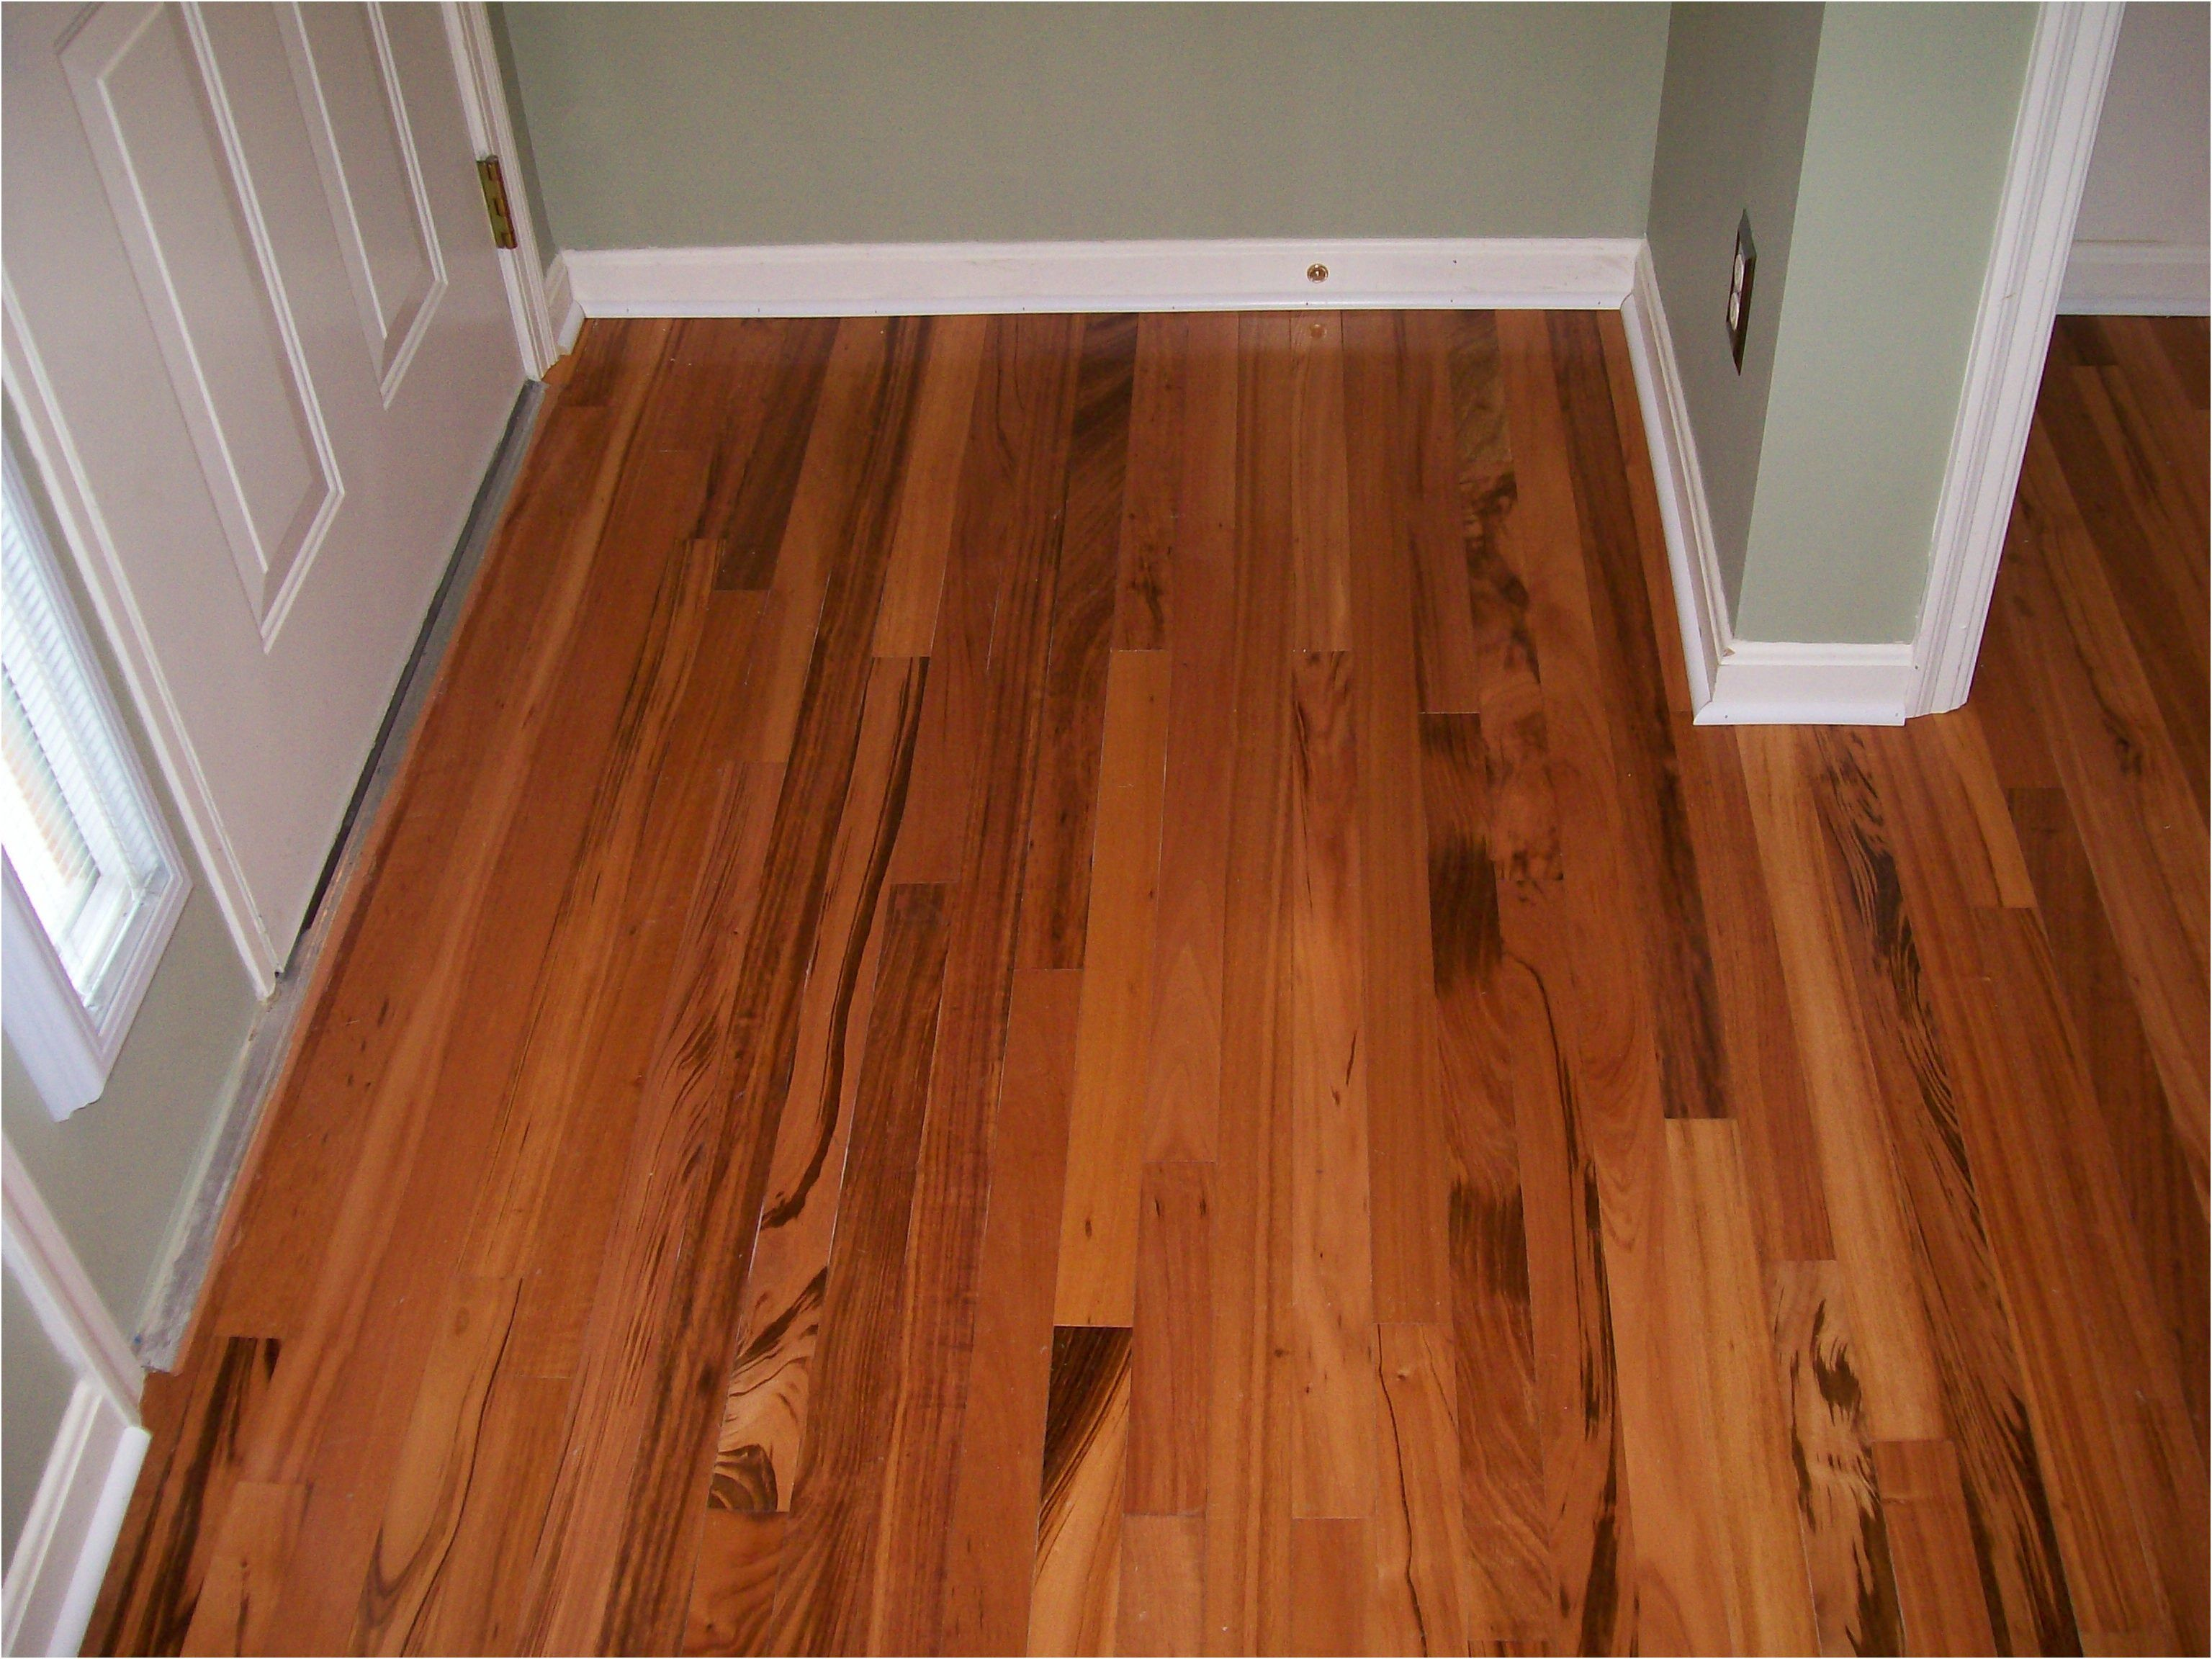 Hardwood Flooring Cost Ottawa. Feels free to follow us! in